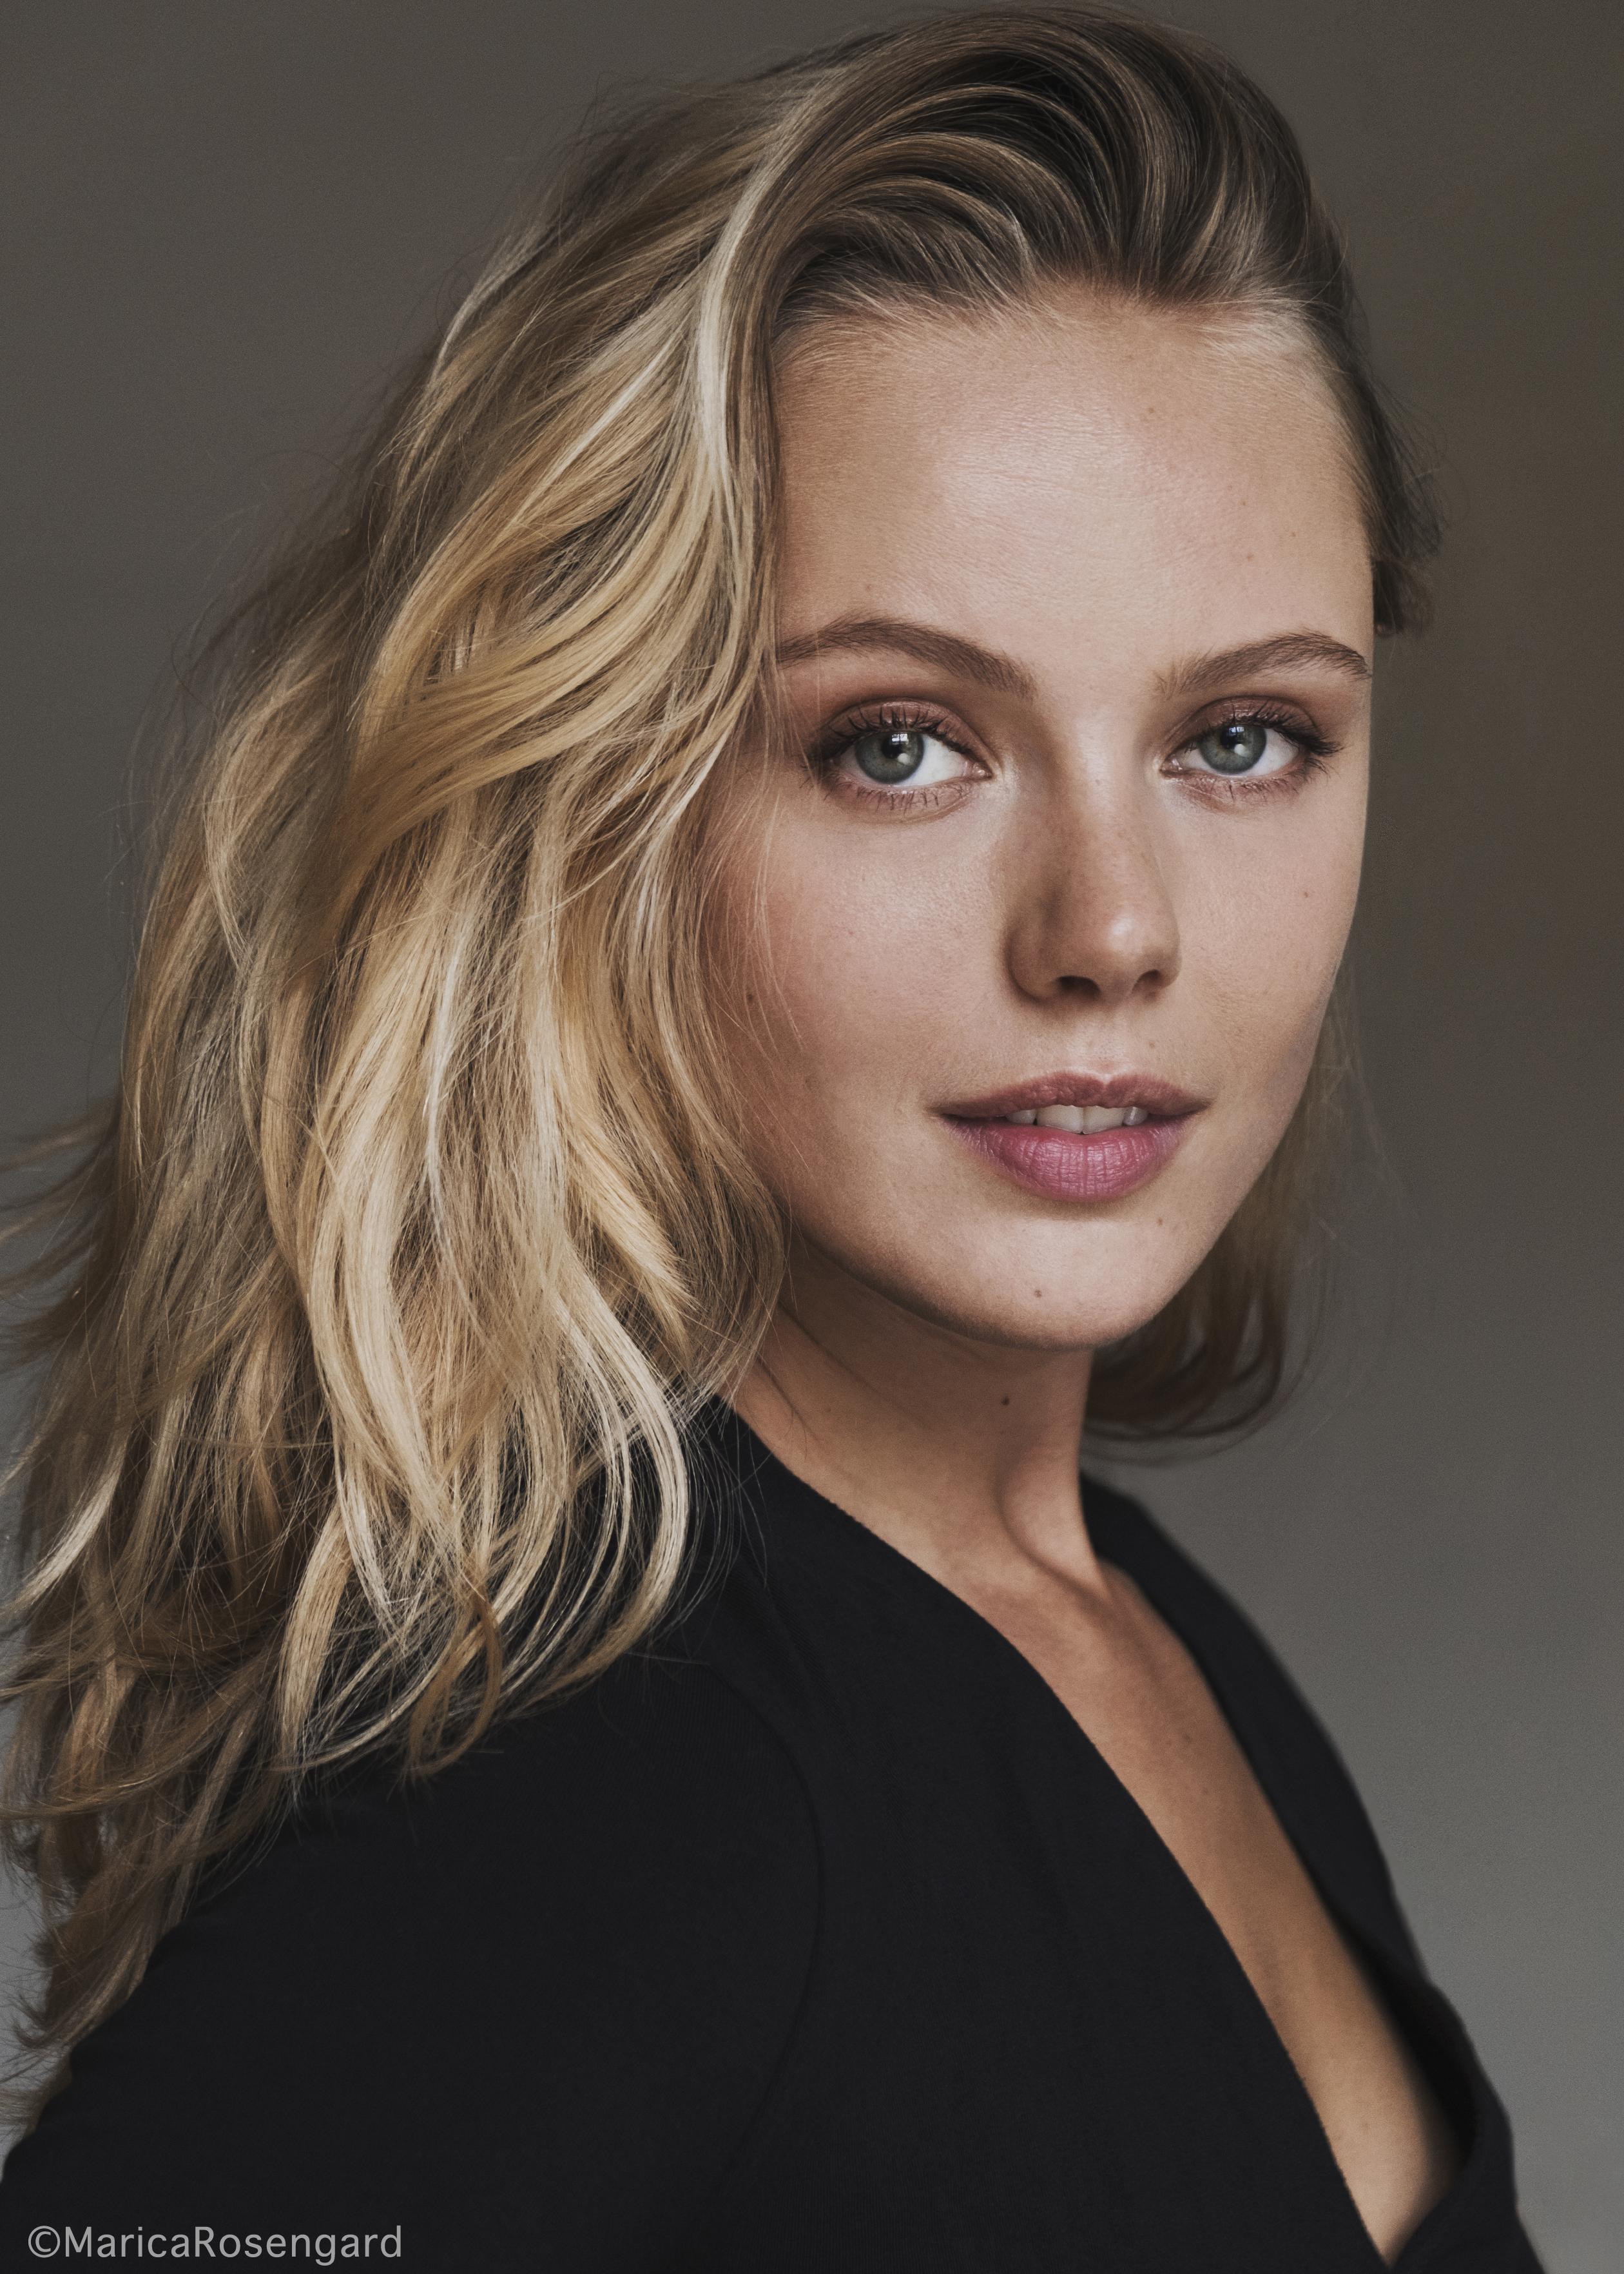 Frida Gustavsson Witcher